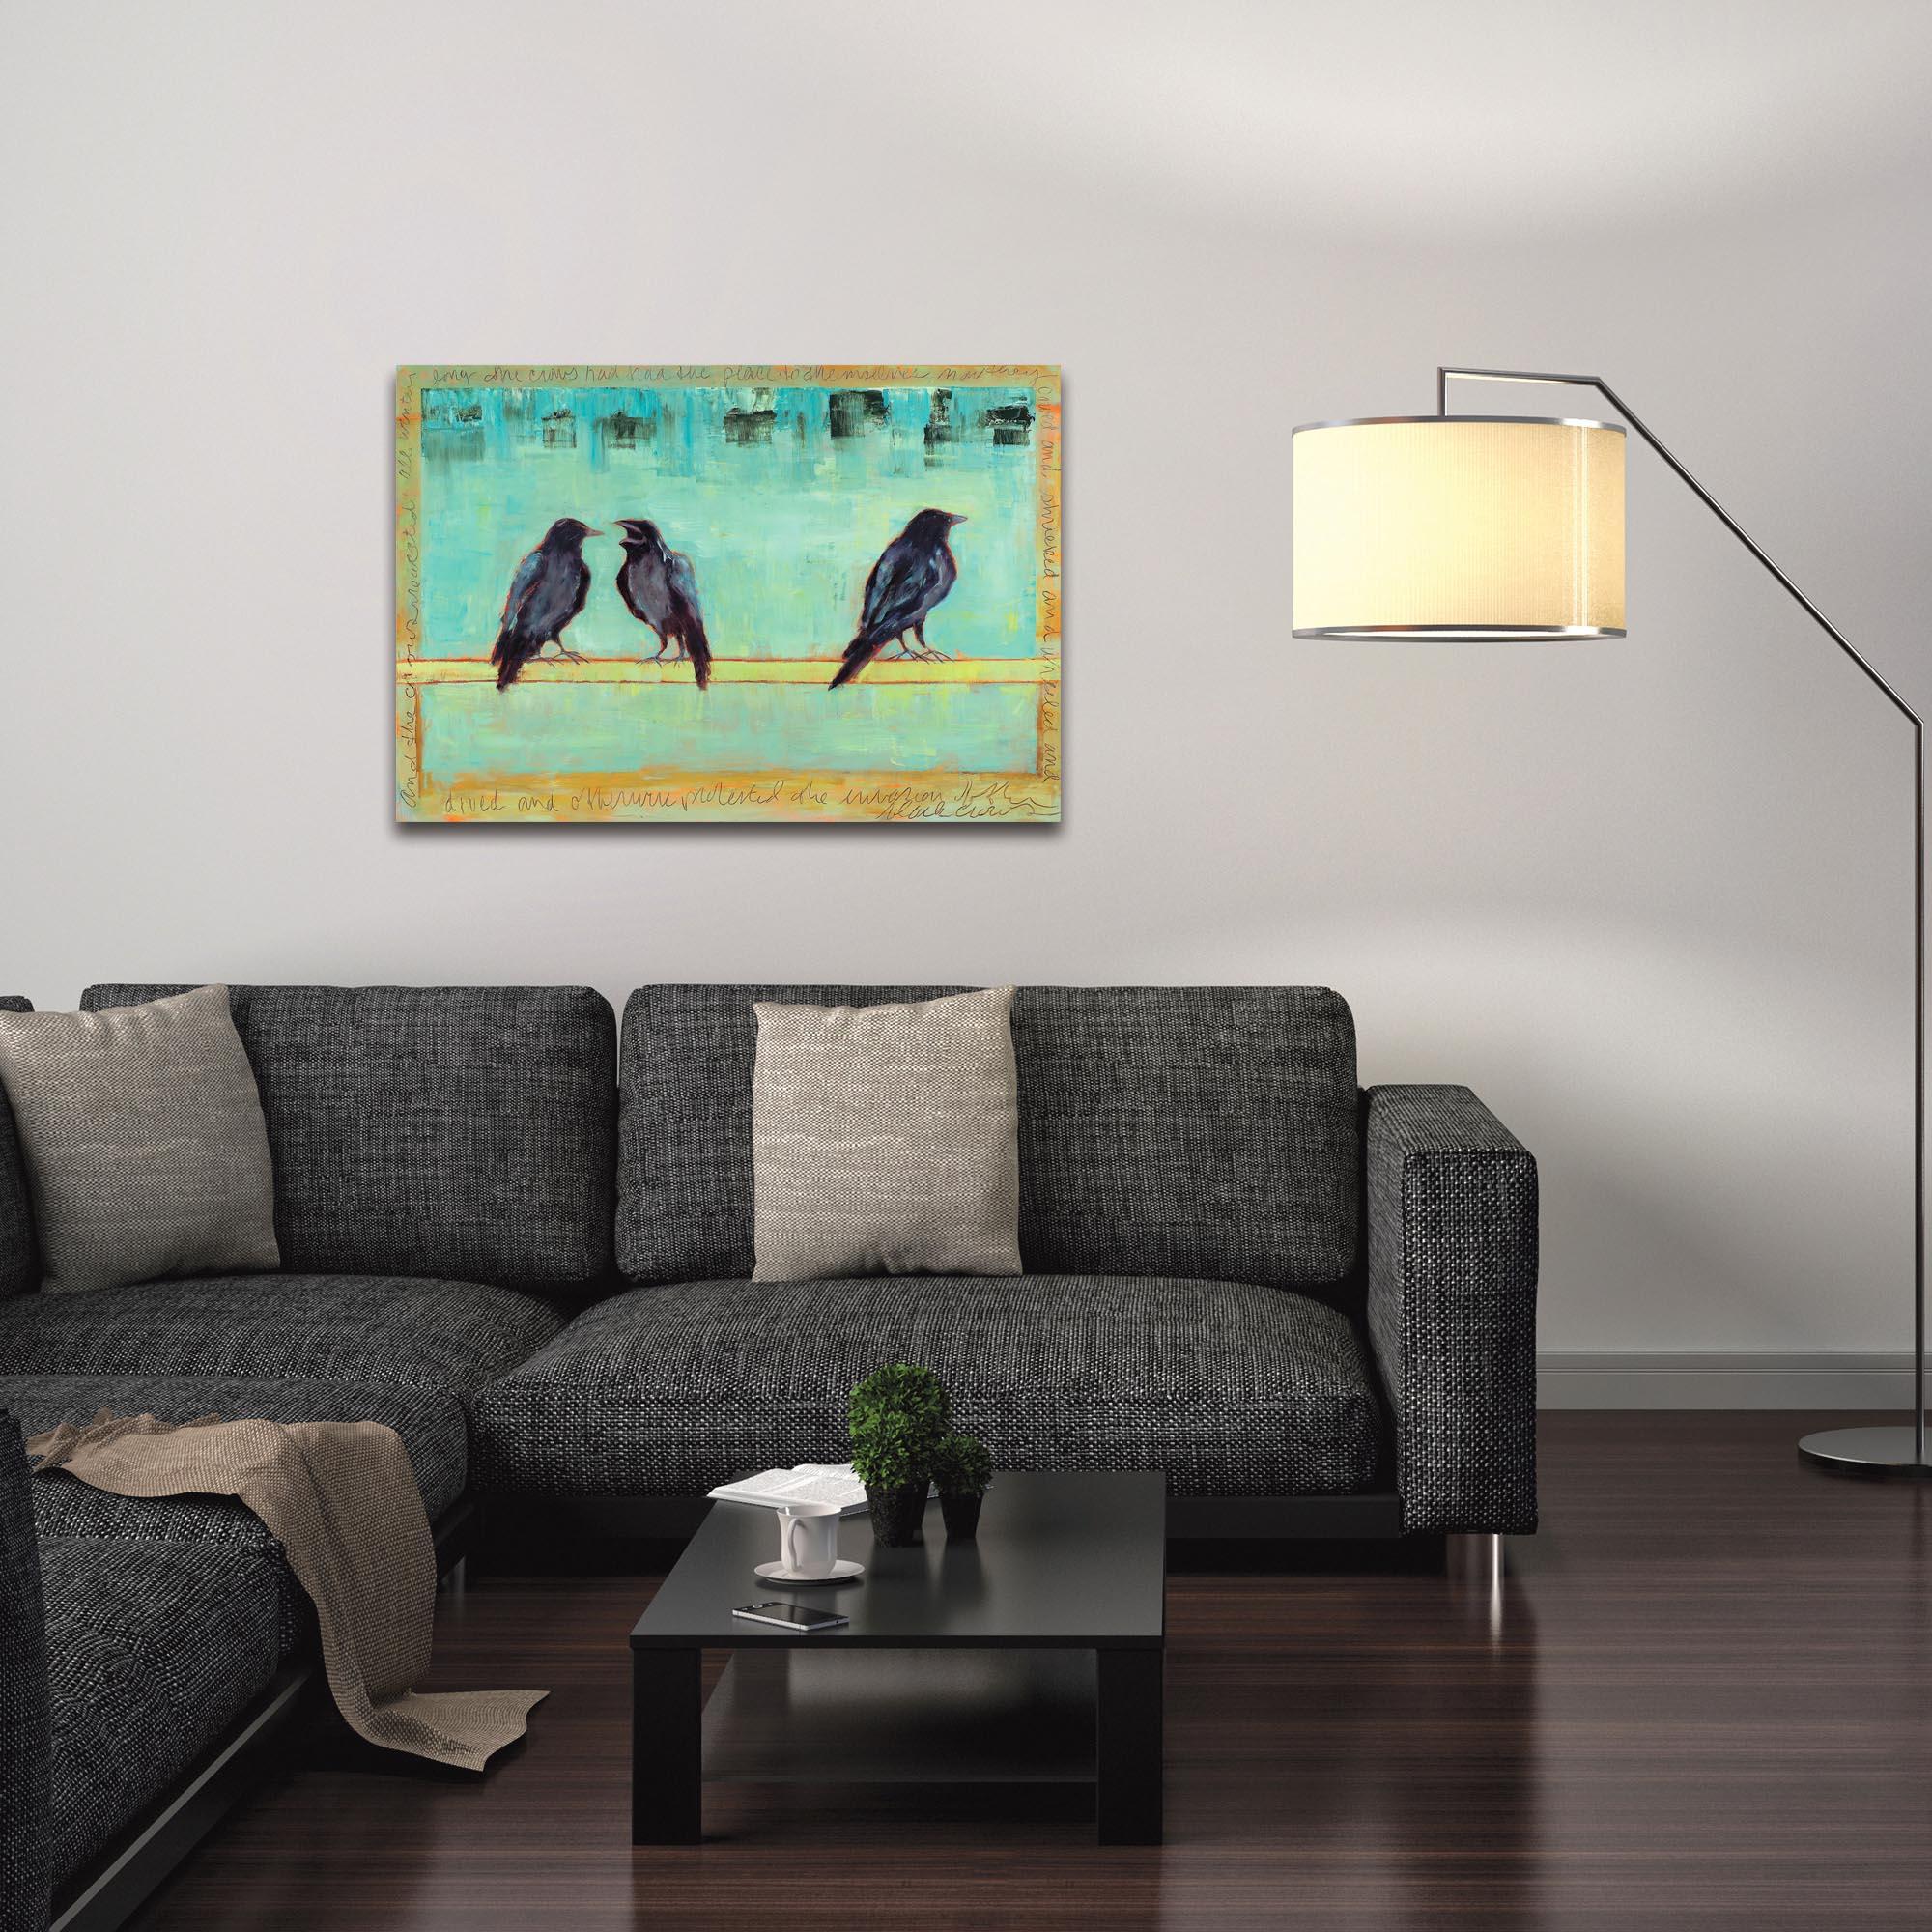 Contemporary Wall Art 'Crow Bar 2' - Urban Birds Decor on Metal or Plexiglass - Lifestyle View